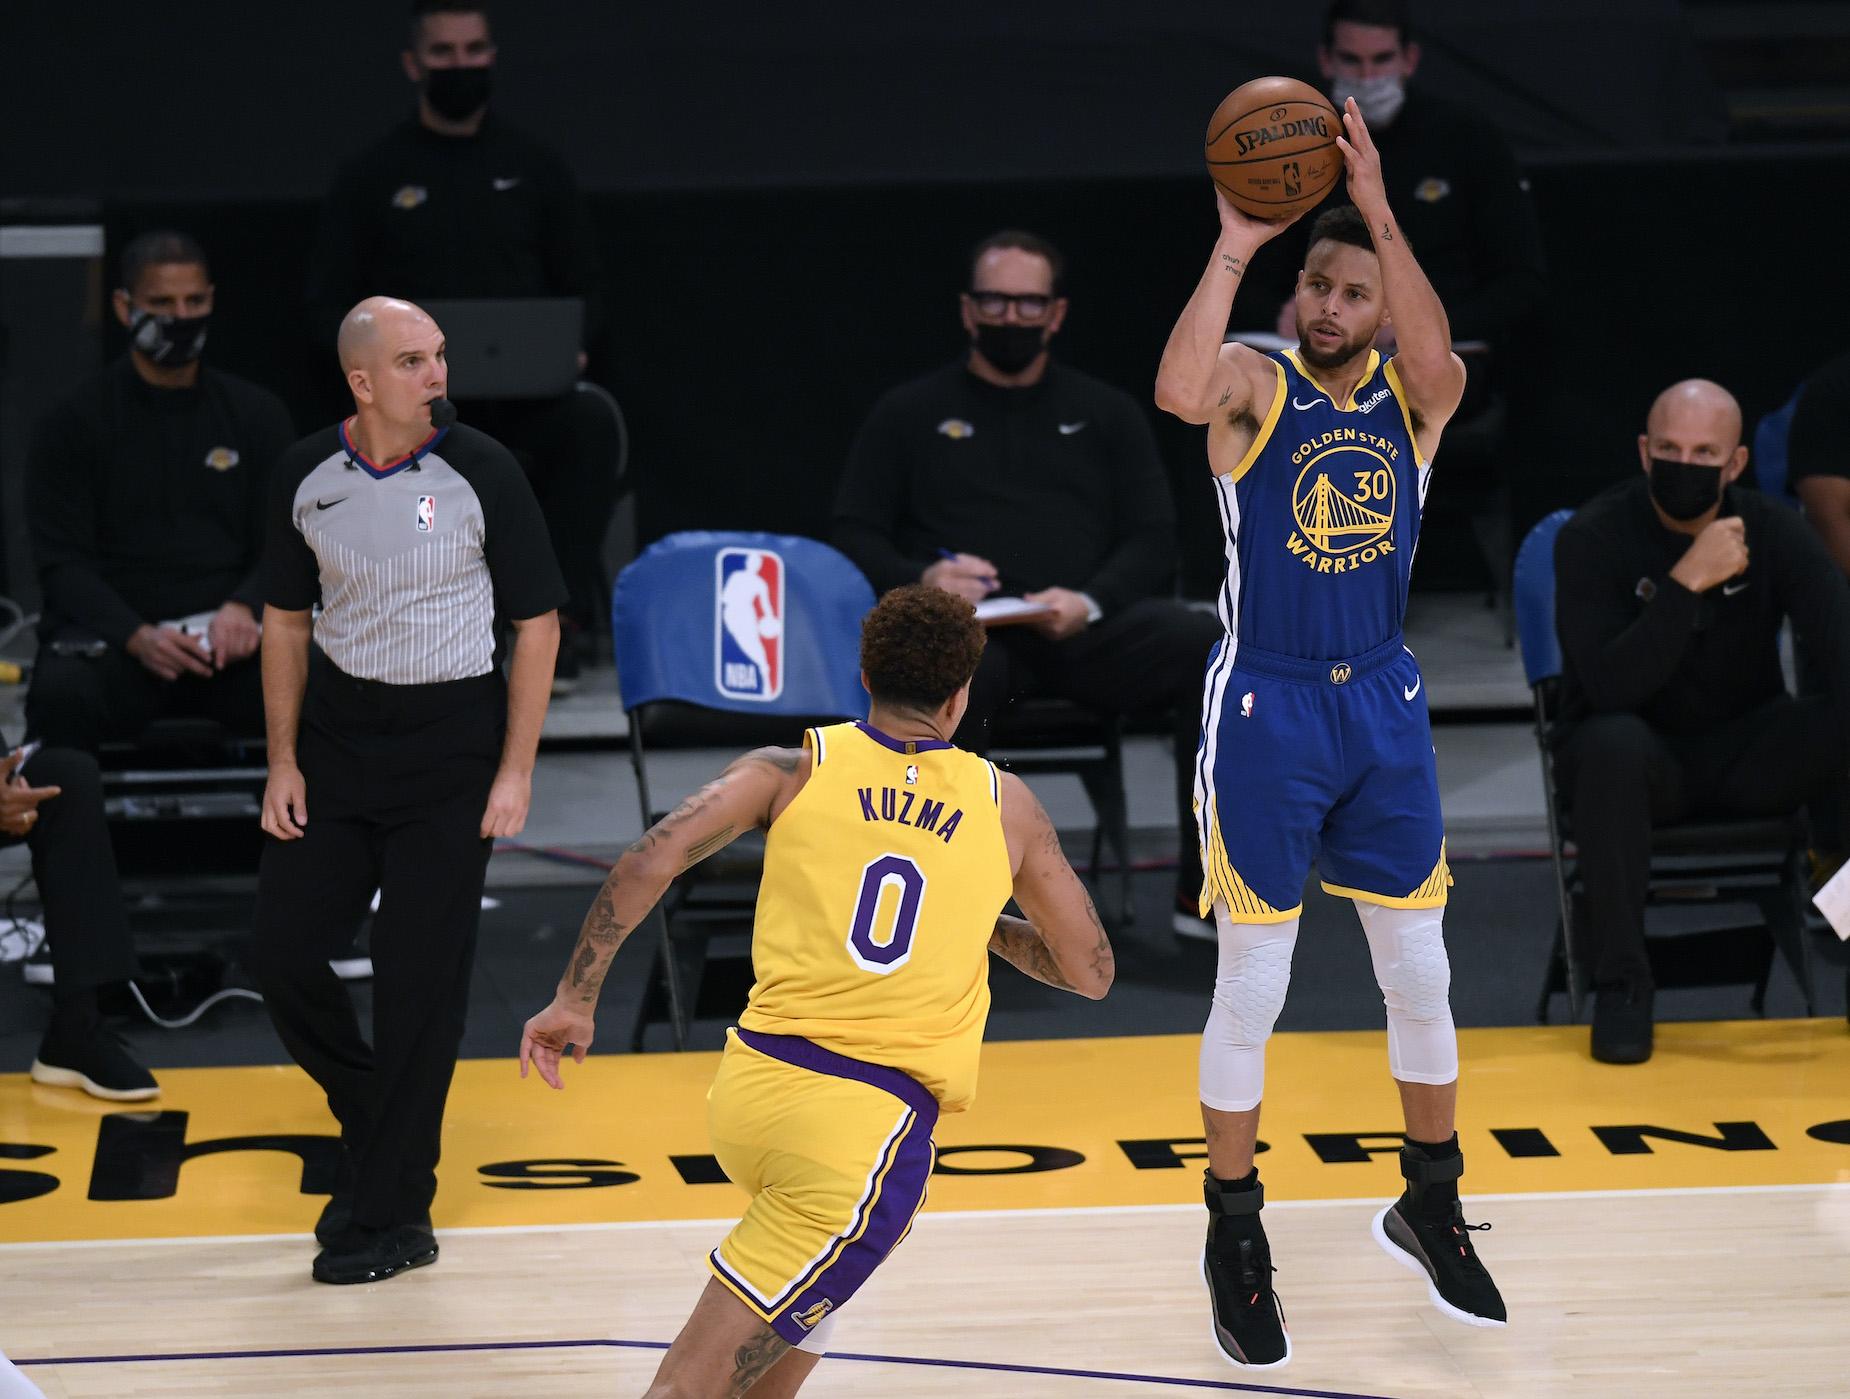 Warriors Star Steph Curry Isn't the 'GOAT Shooter,' According to a Veteran NBA Marksman